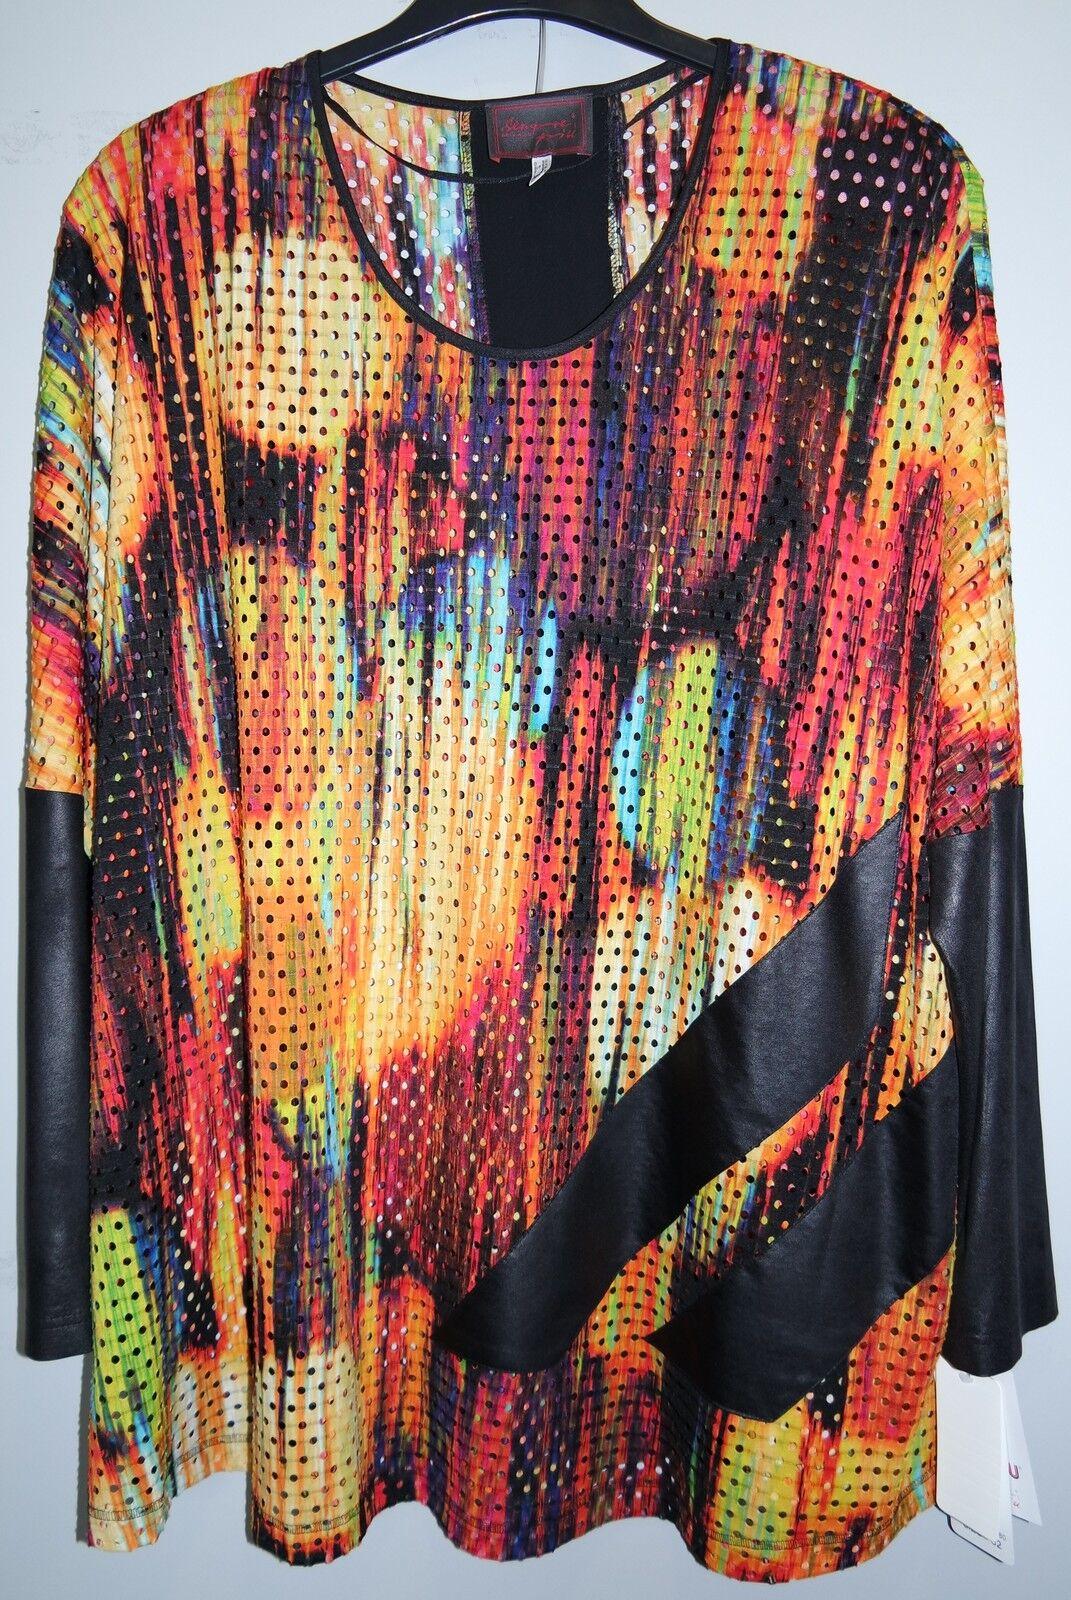 Tunika Netz Transpa. bunt Gr.54 Marke Sempre Piu by Chalou Polyester 30%